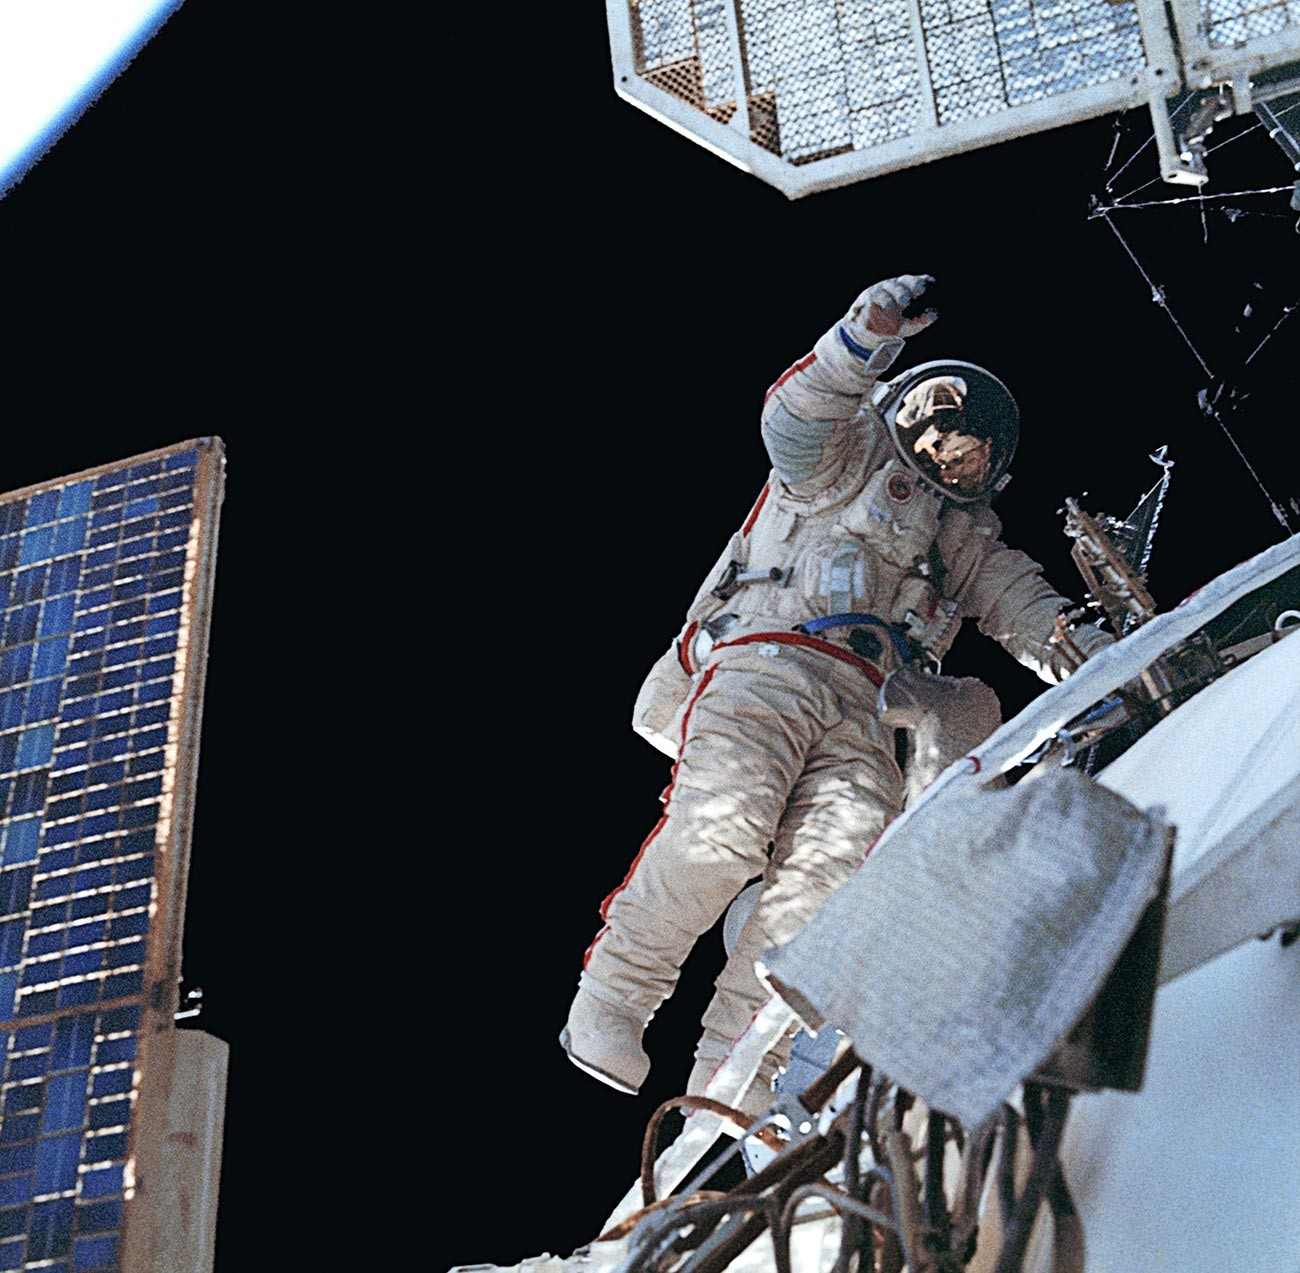 Cosmonauta Aleksandr Volkov durante caminhada espacial